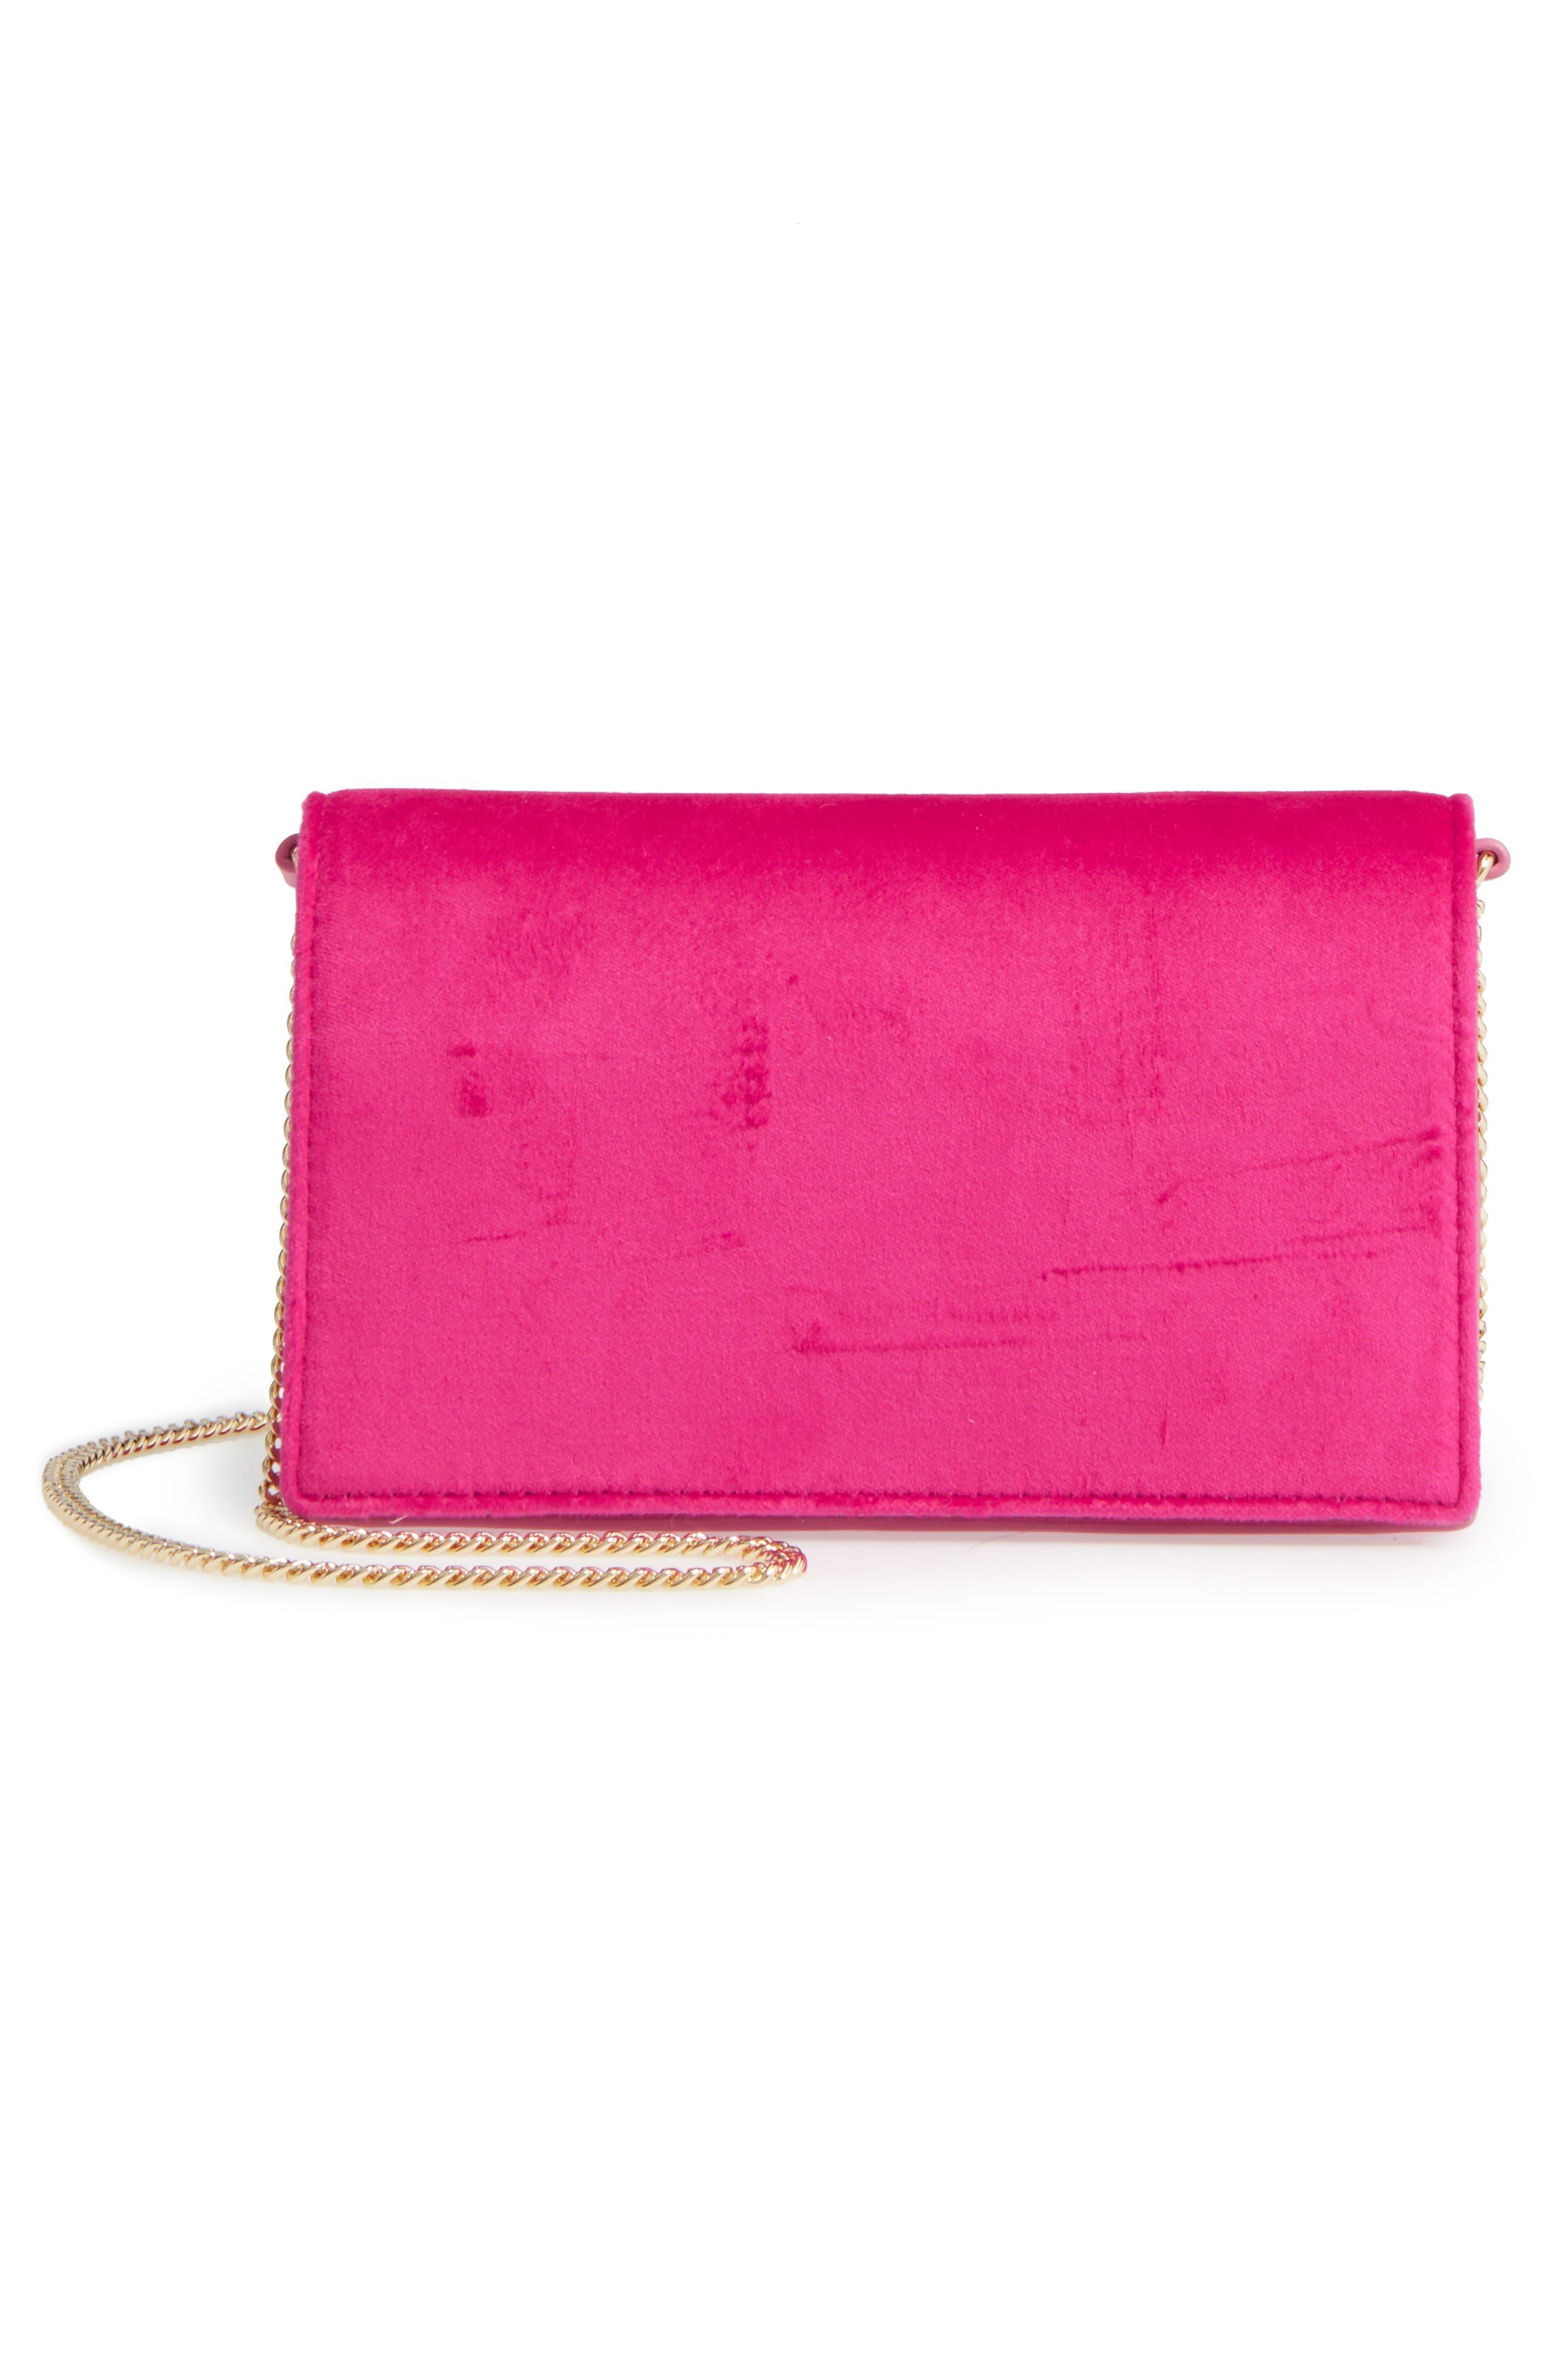 Soirée Velvet Convertible Crossbody Bag,                             Alternate thumbnail 6, color,                             Pink Azalea